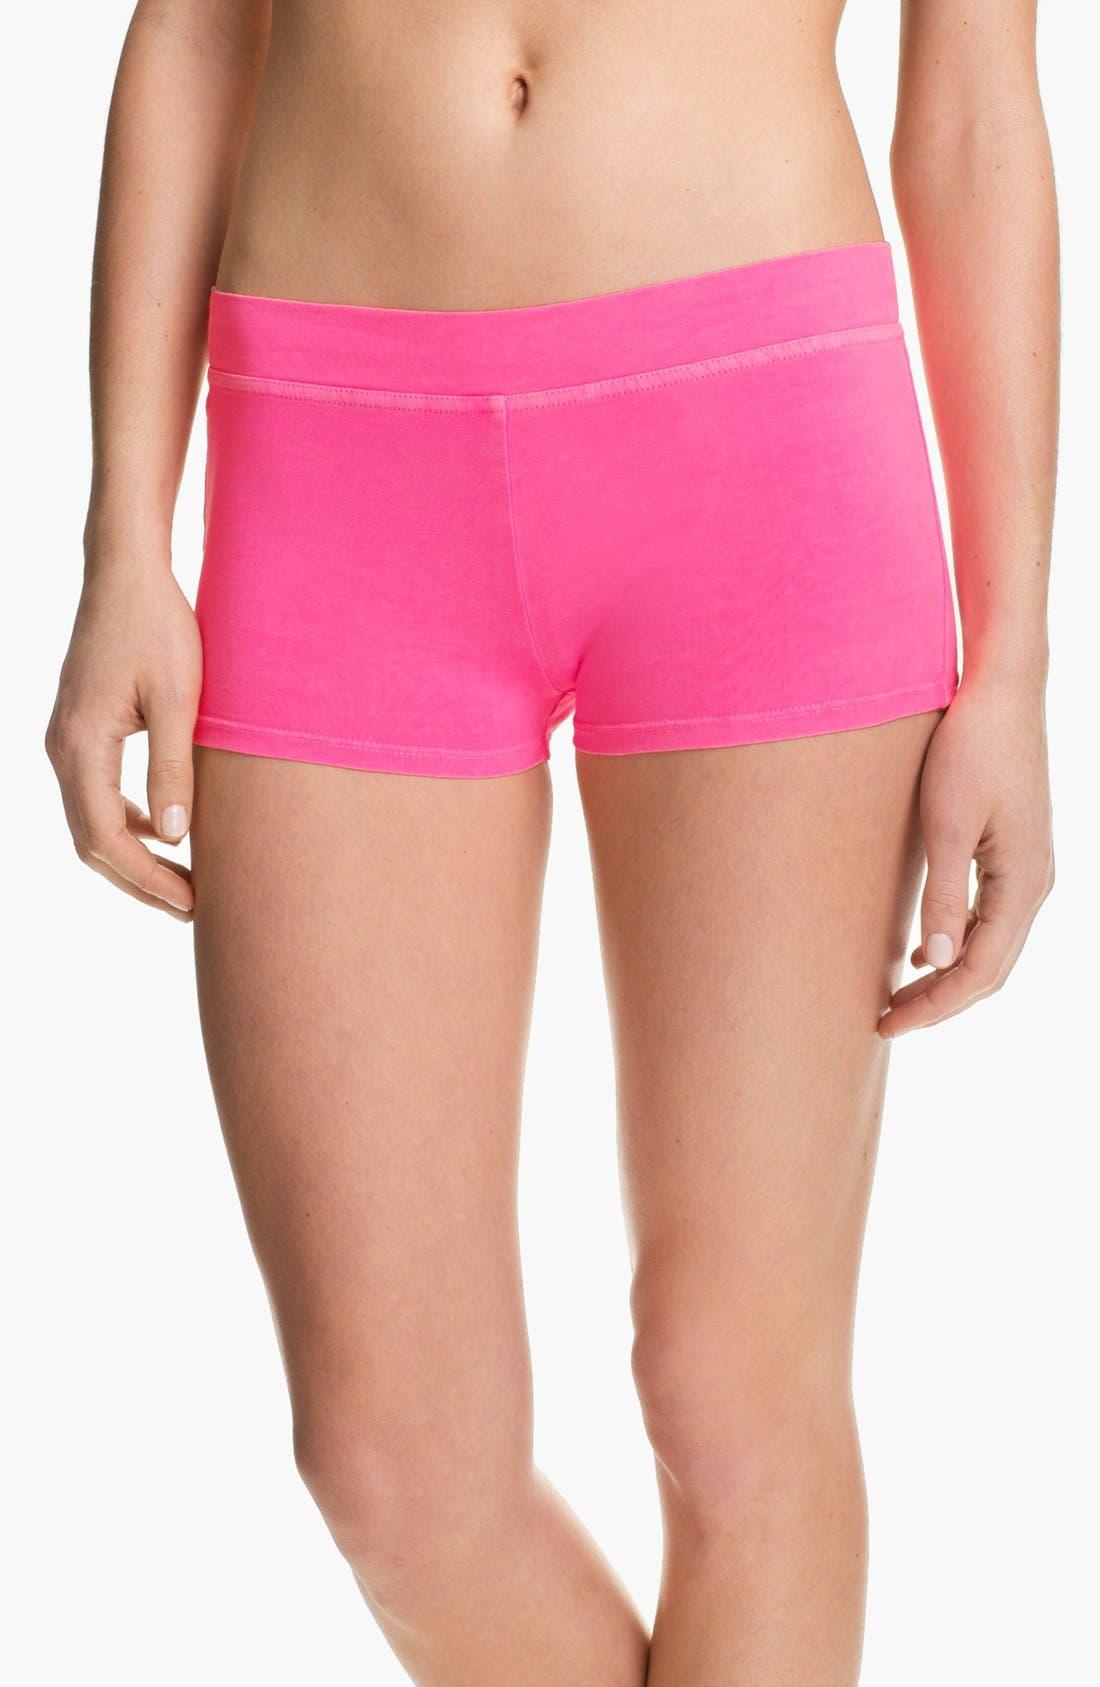 Alternate Image 1 Selected - Make + Model 'Shorty' Shorts